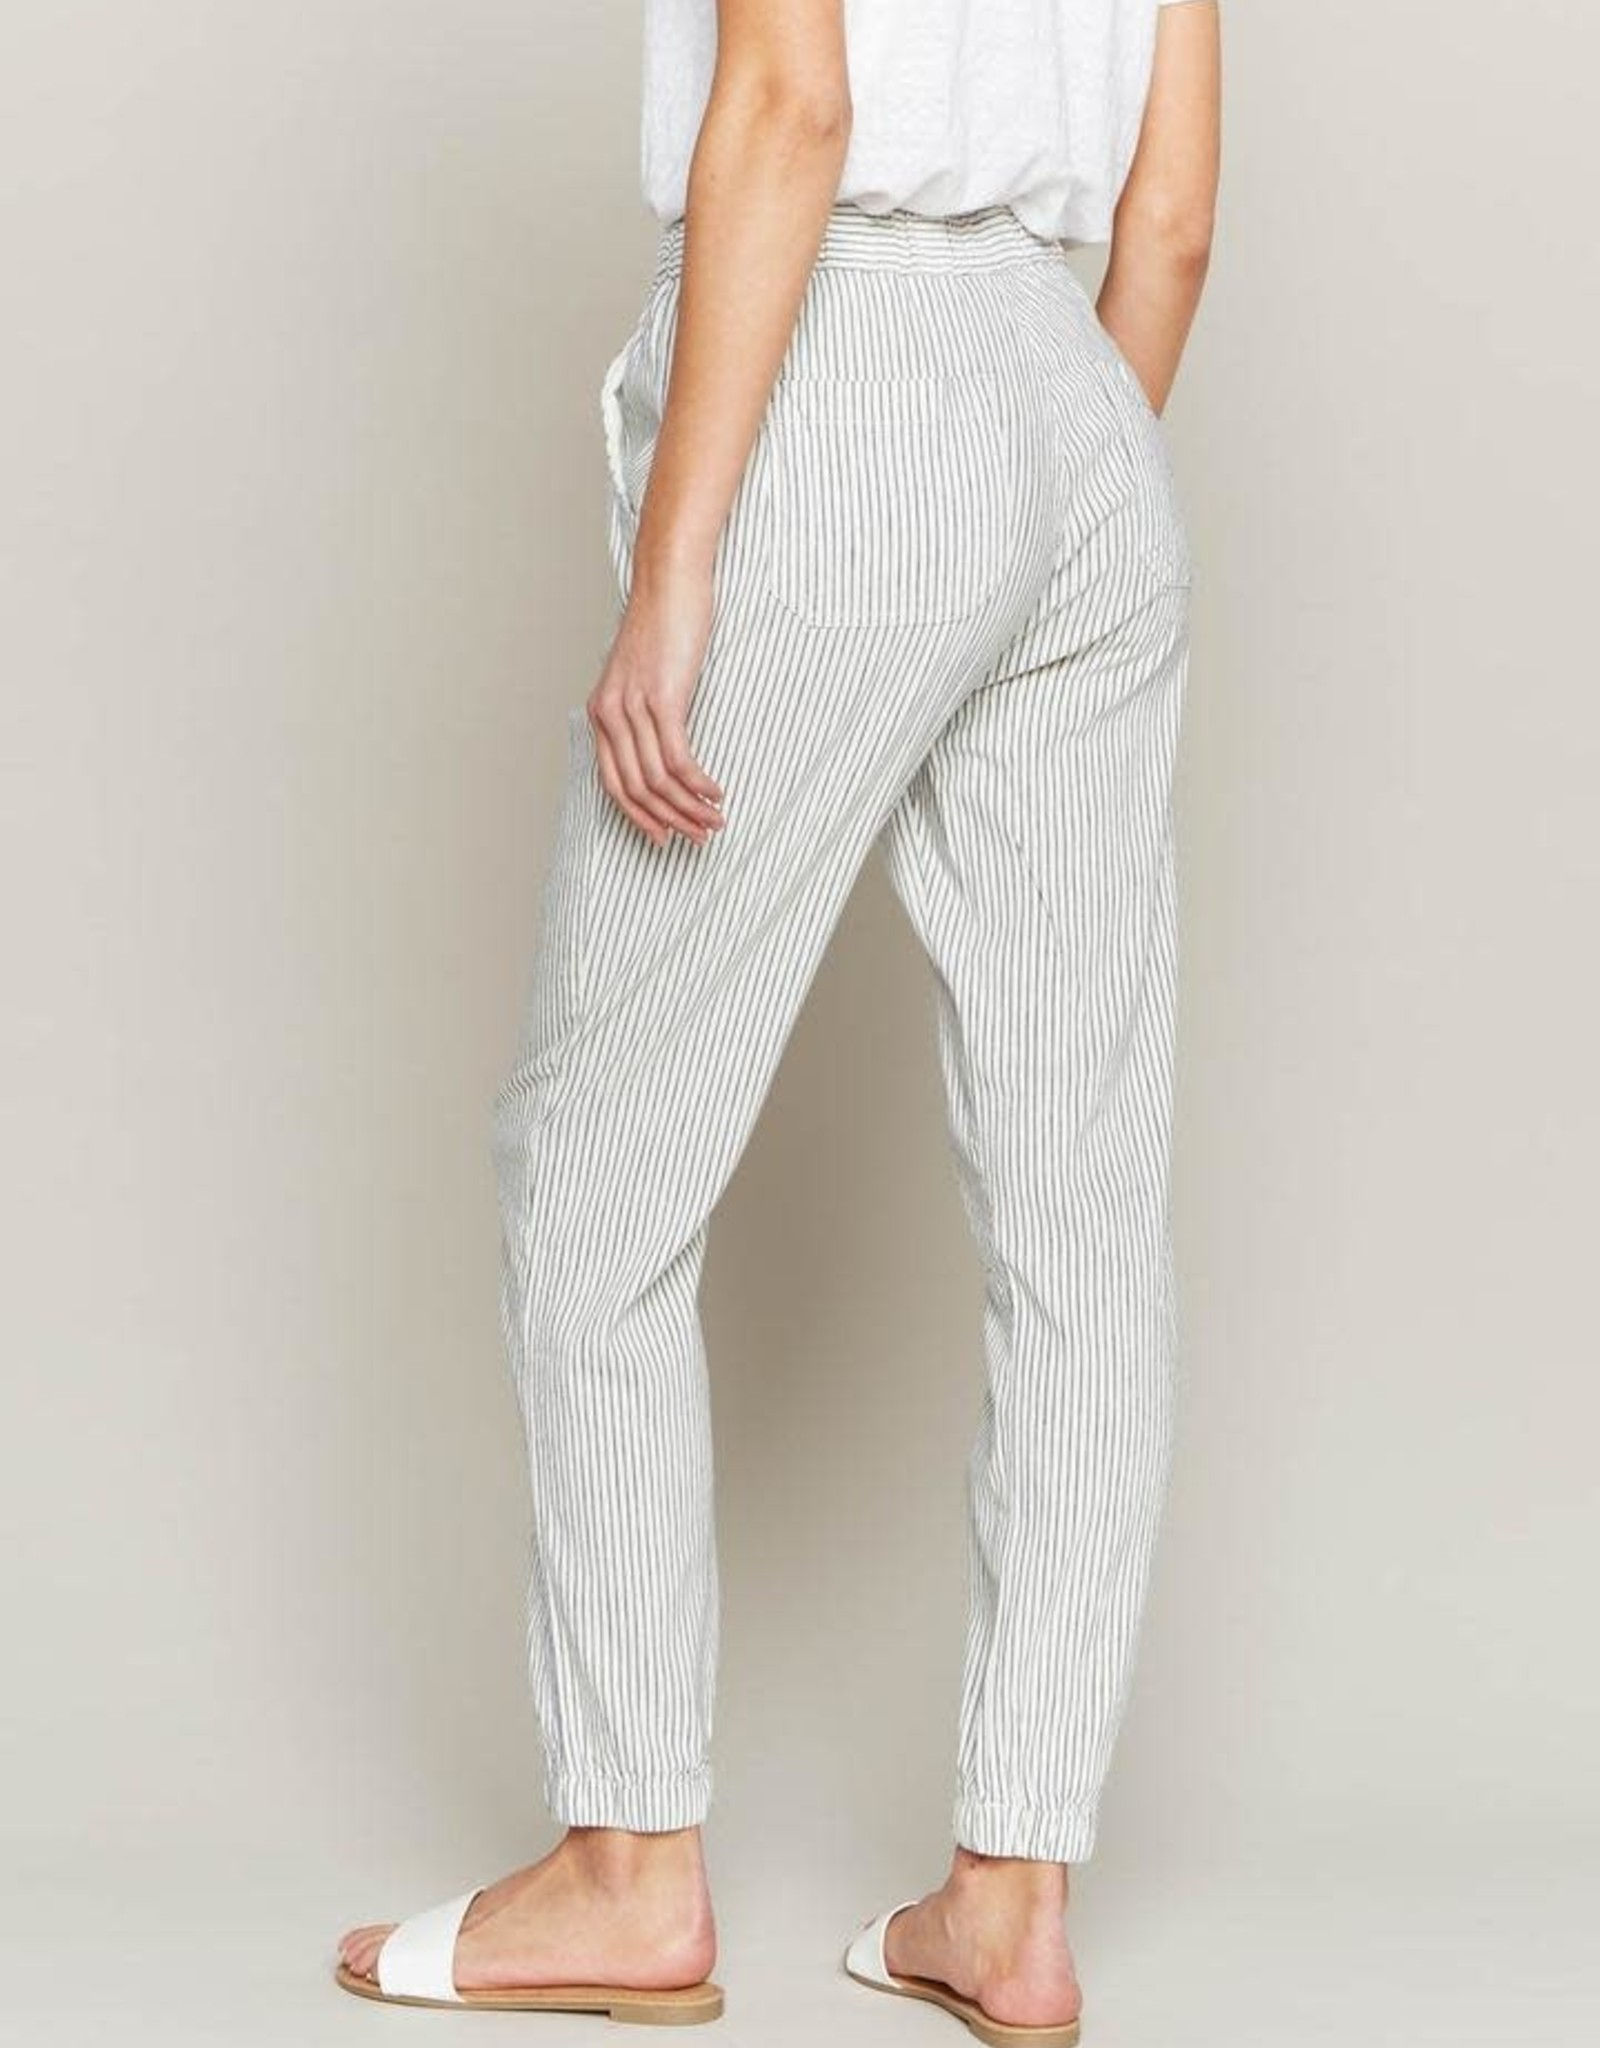 THREAD & SUPPLY AXLE Pin Stripe Pant